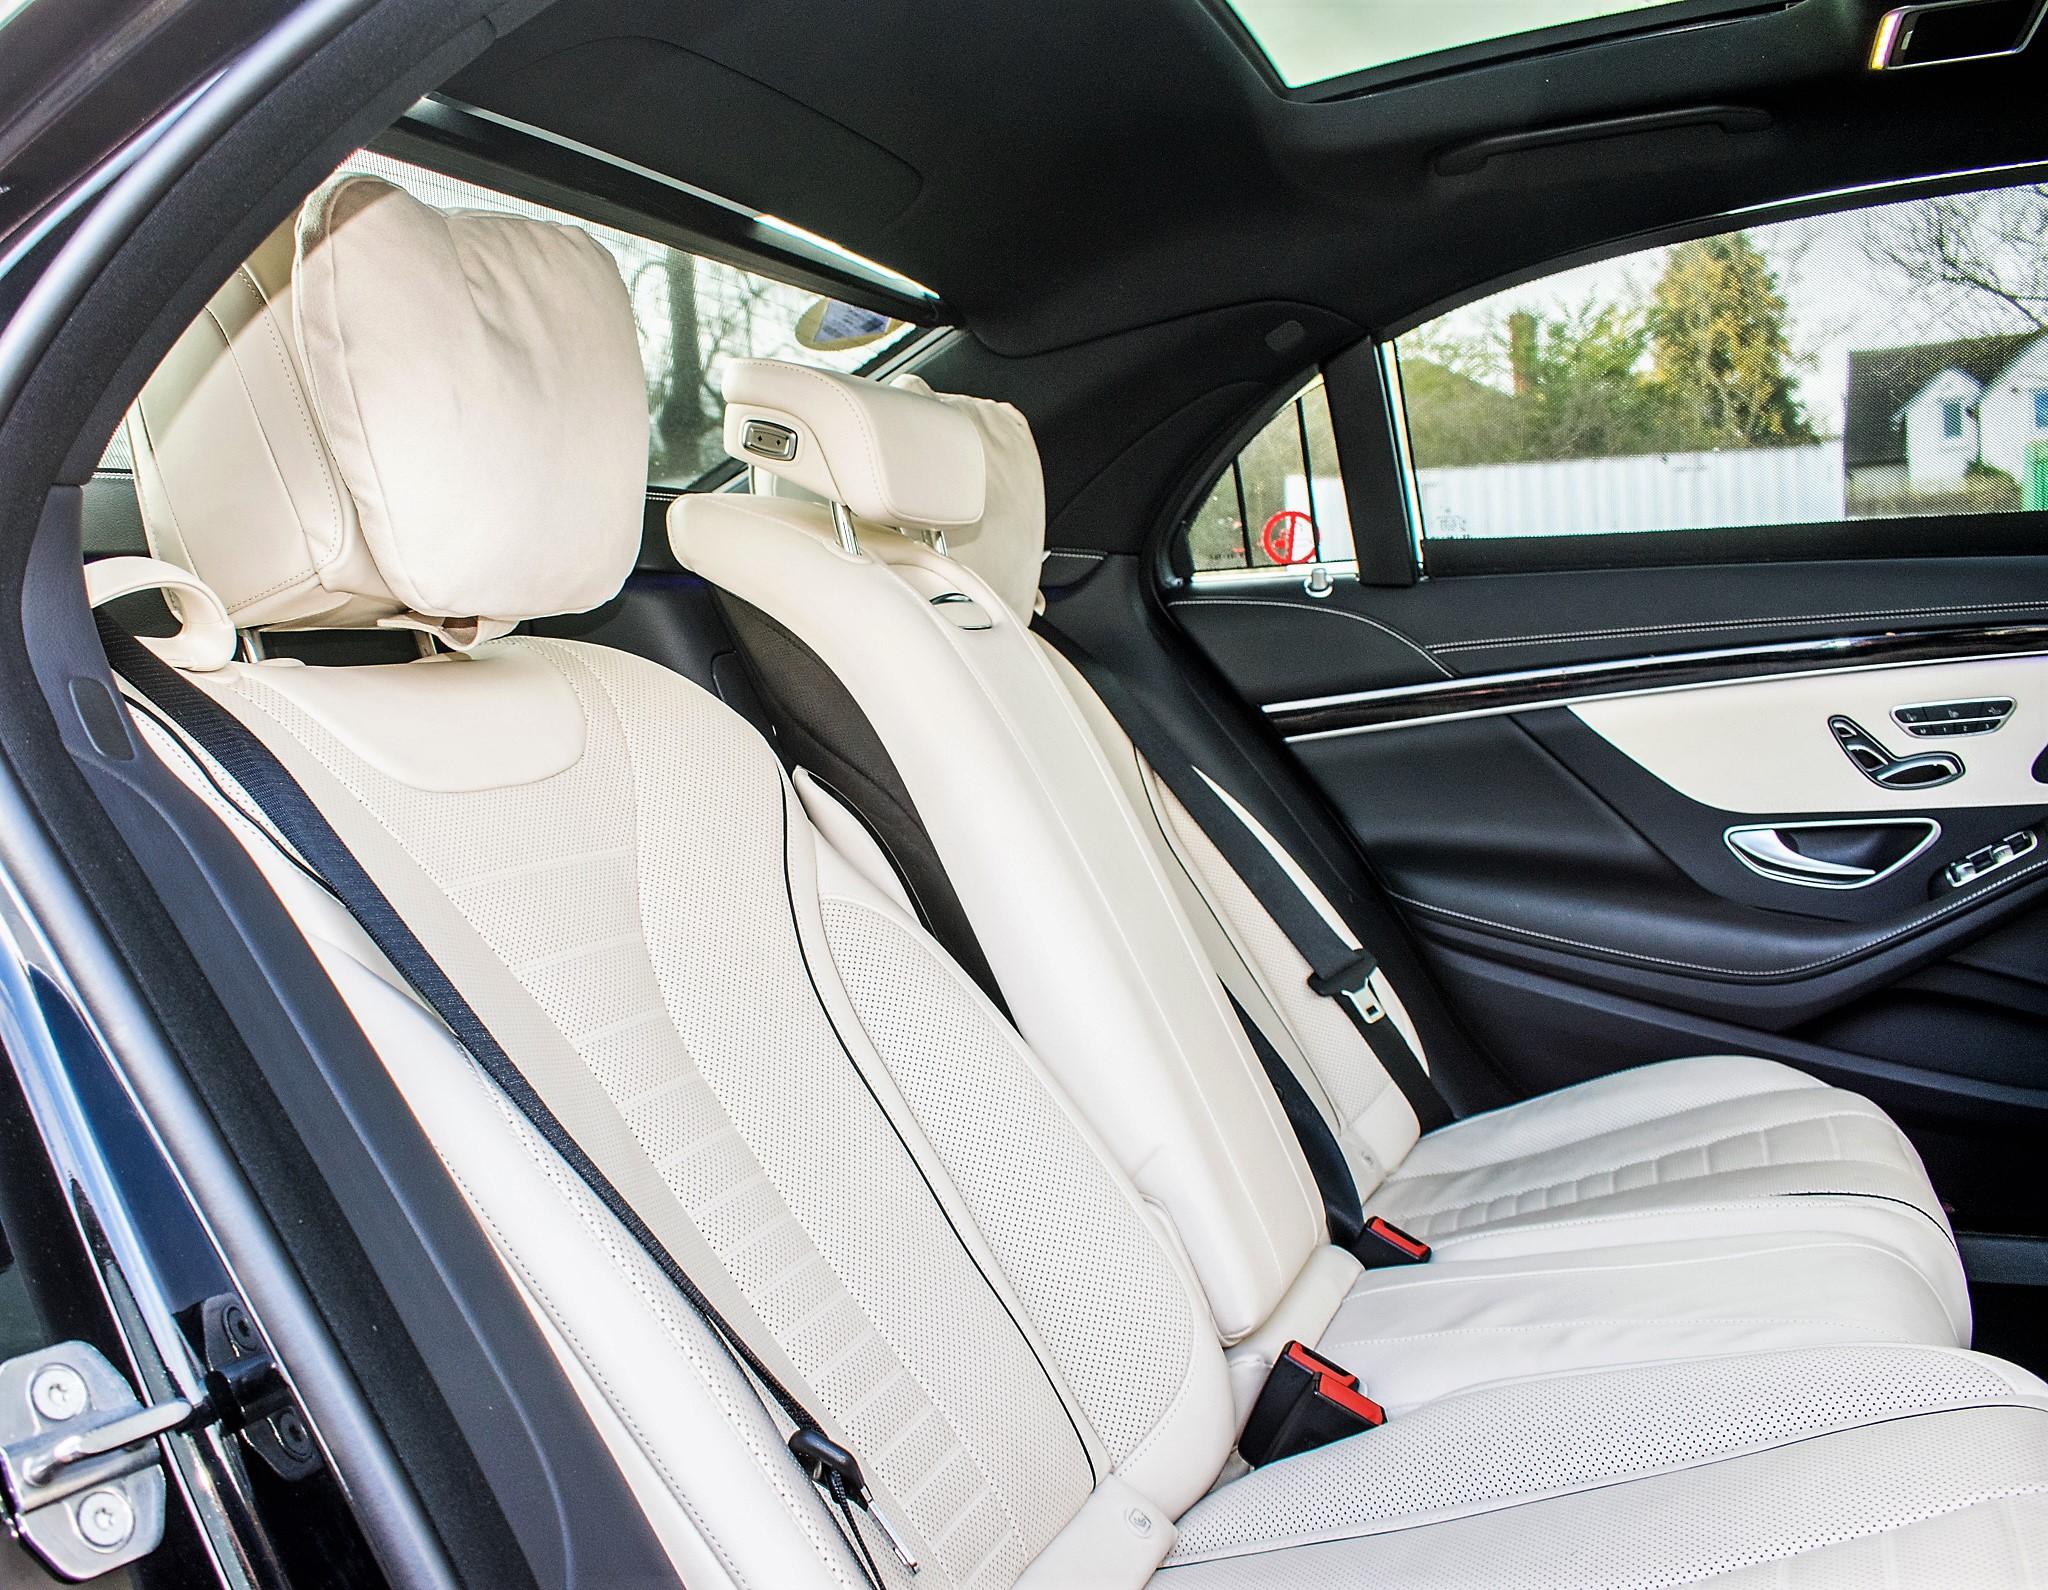 Mercedes Benz S450 L AMG Line Executive auto petrol 4 door saloon car Registration Number: FX68 - Image 24 of 30